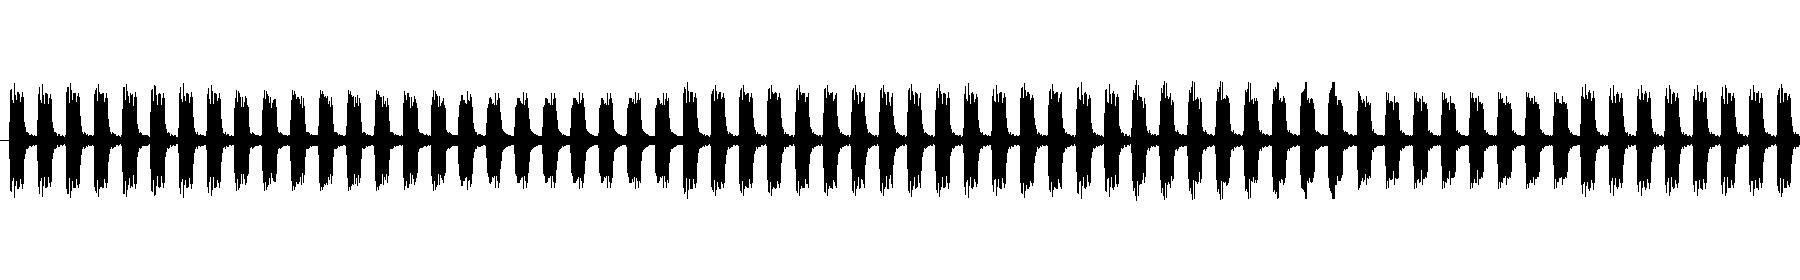 chords 150